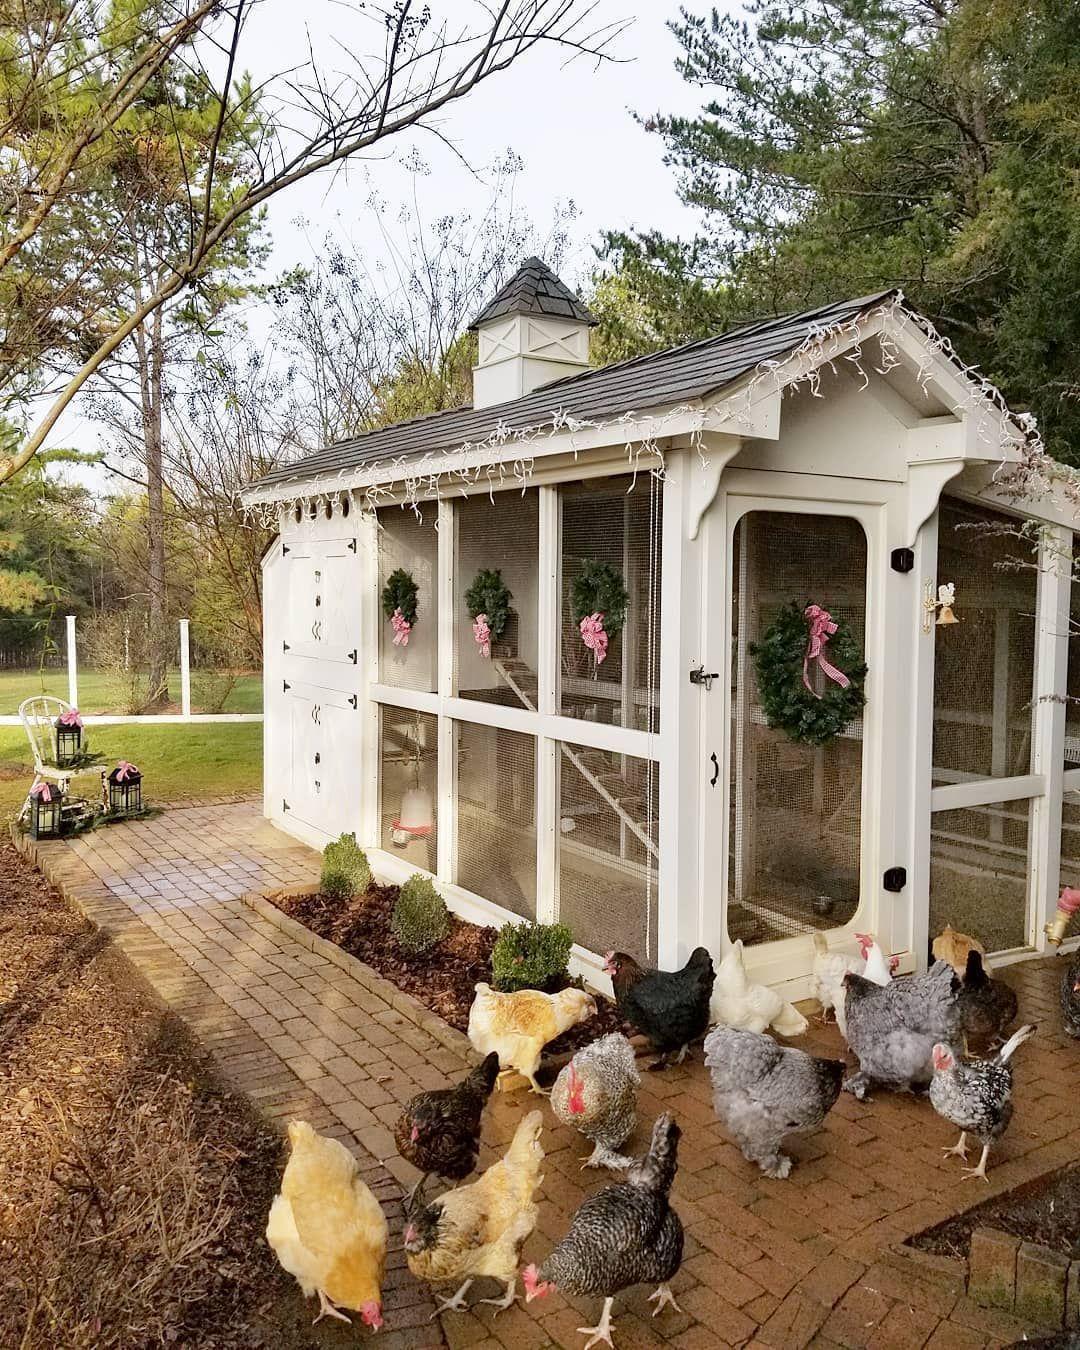 Backyard Chicken Coop Plans Backyard Chicken Coops: Backyard Chicken Coop Plans, Backyard Chicken Coops, Backyard